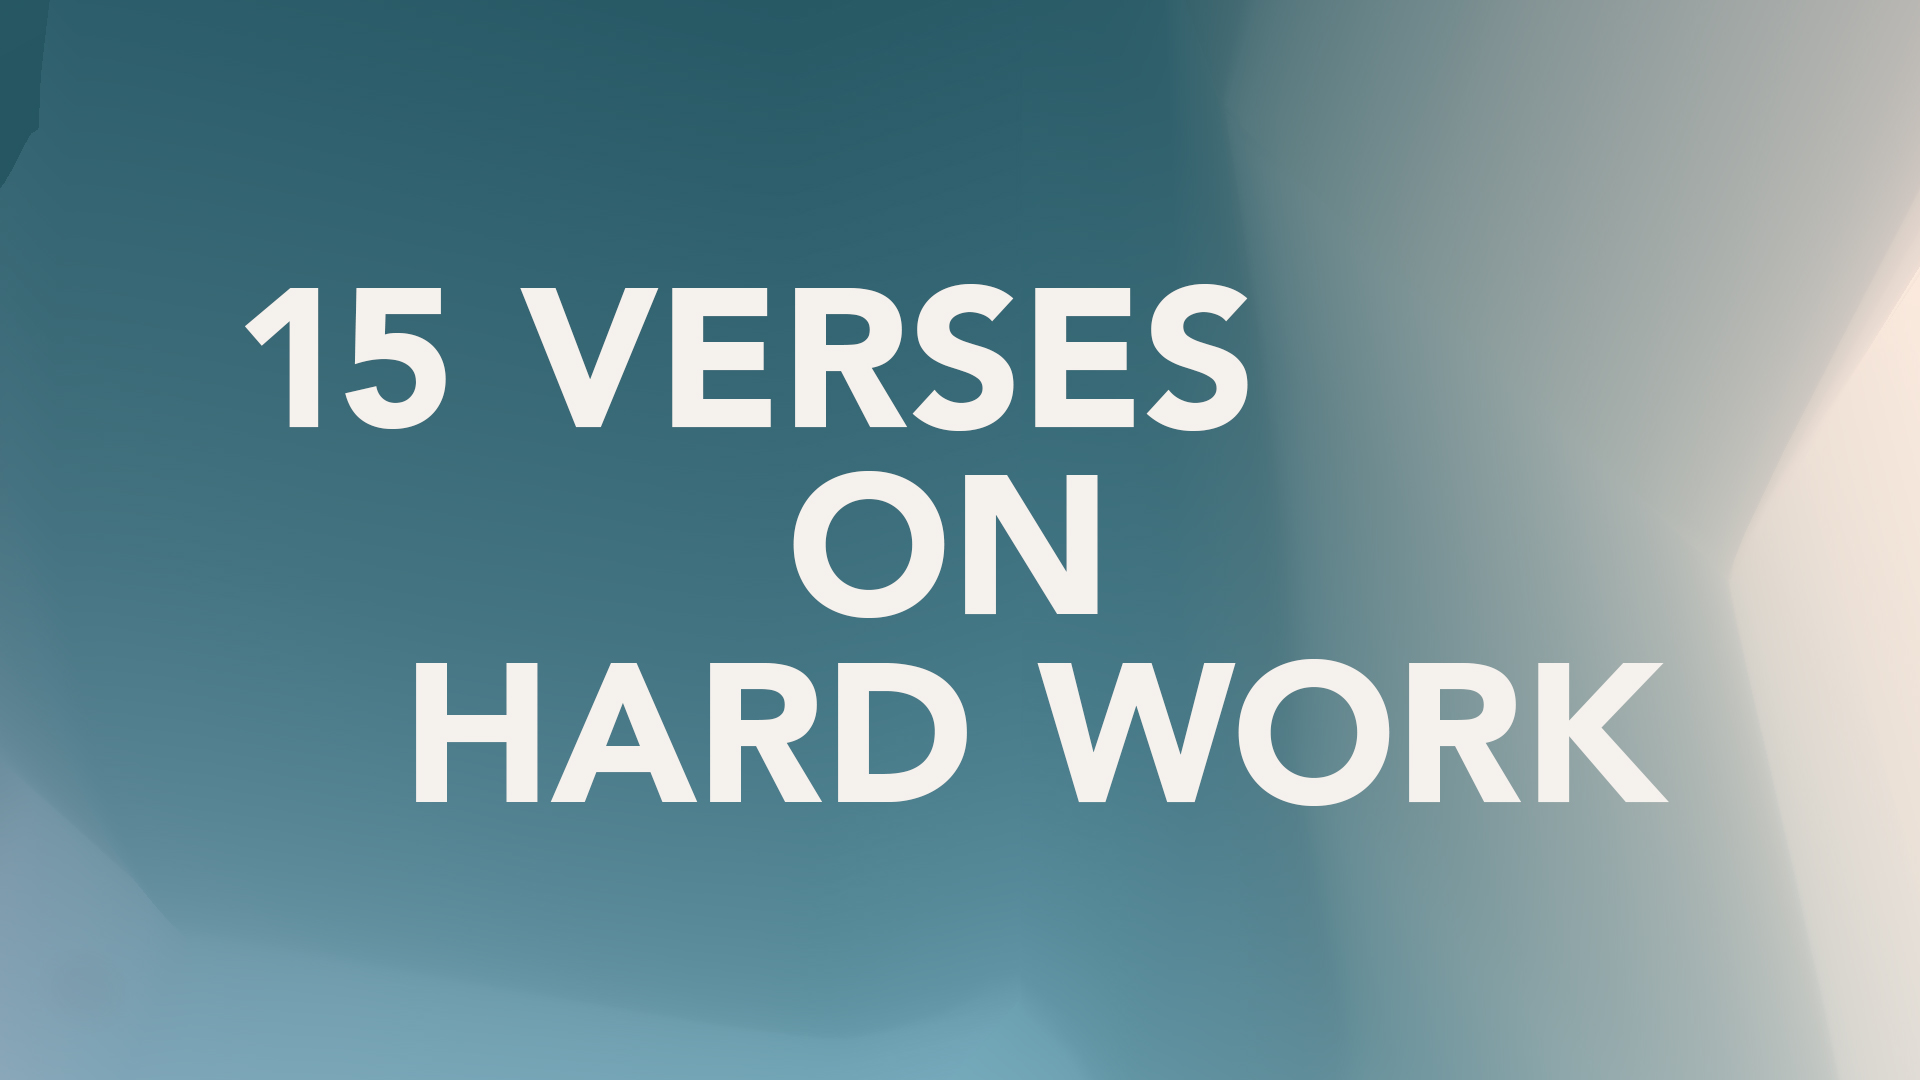 Working Hard: 15 Verses to Help Hero Image